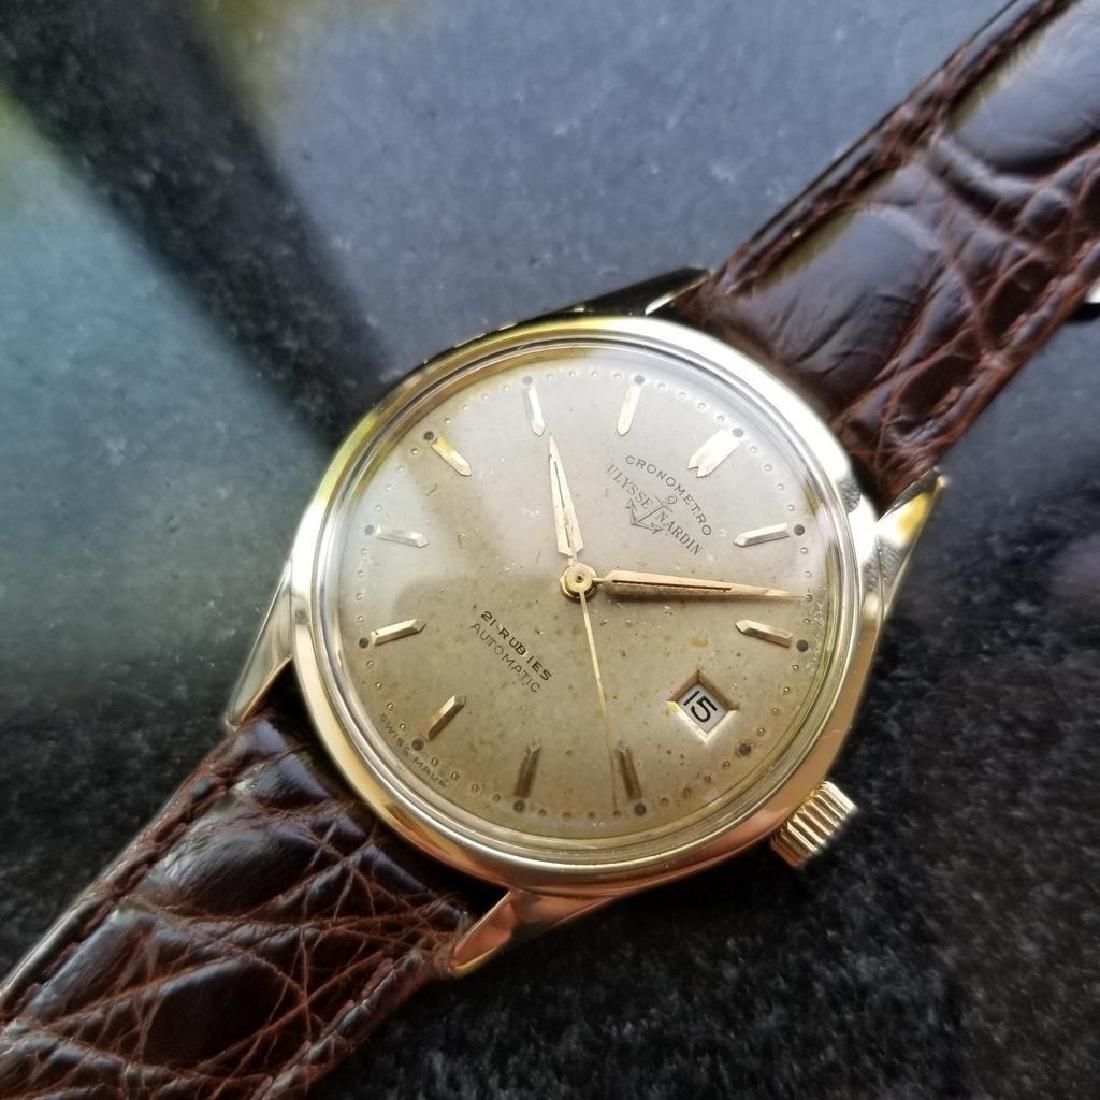 Vintage ULYSSE NARDIN Chronometer Automatic w/ date